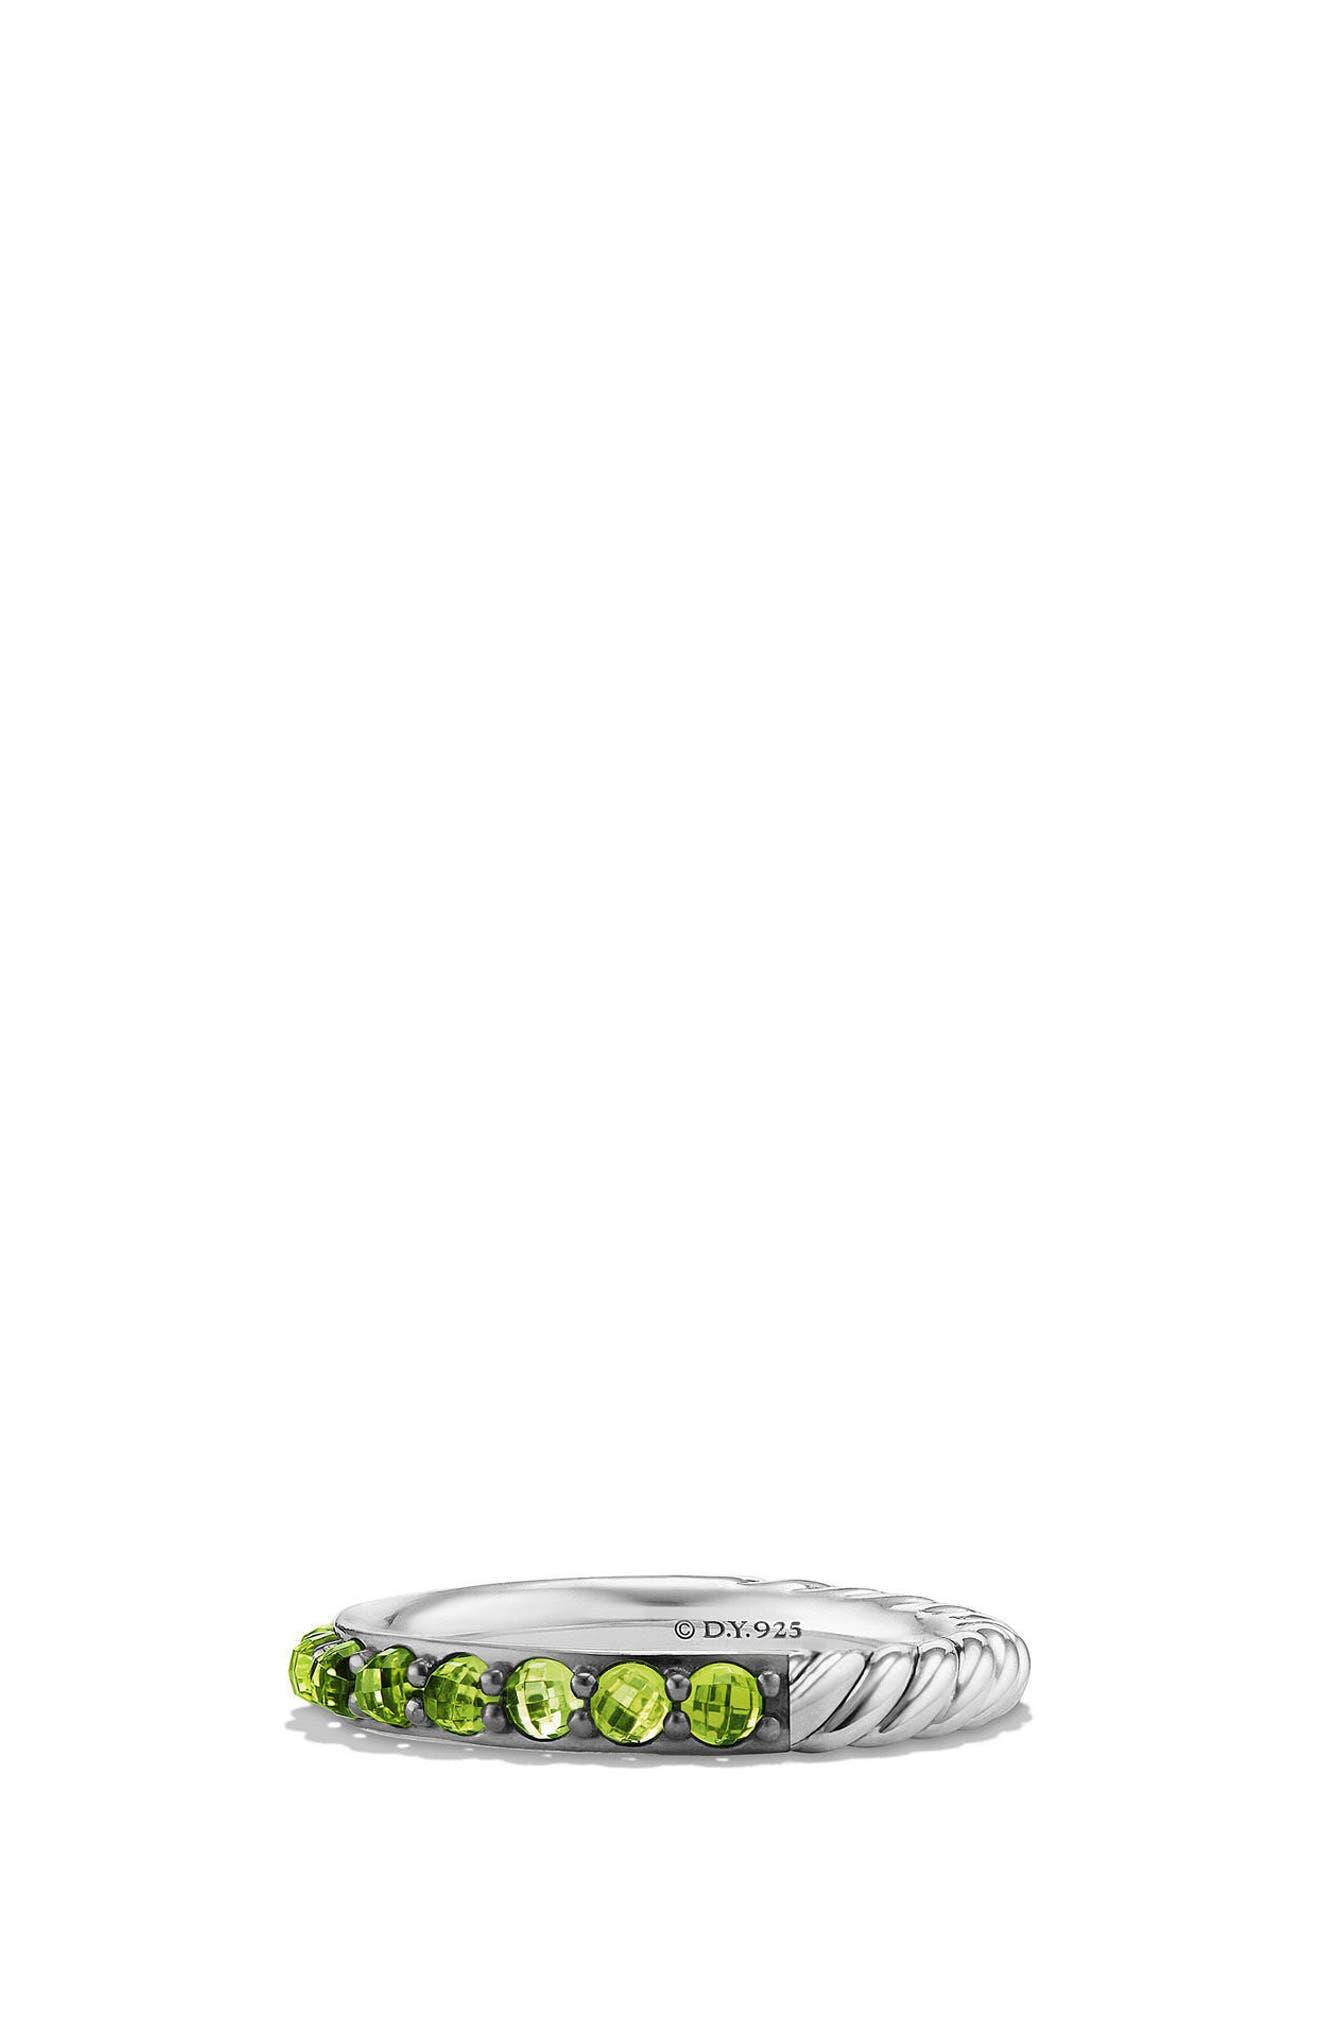 Cable Berries Semiprecious Stone Stack Ring,                             Main thumbnail 1, color,                             040